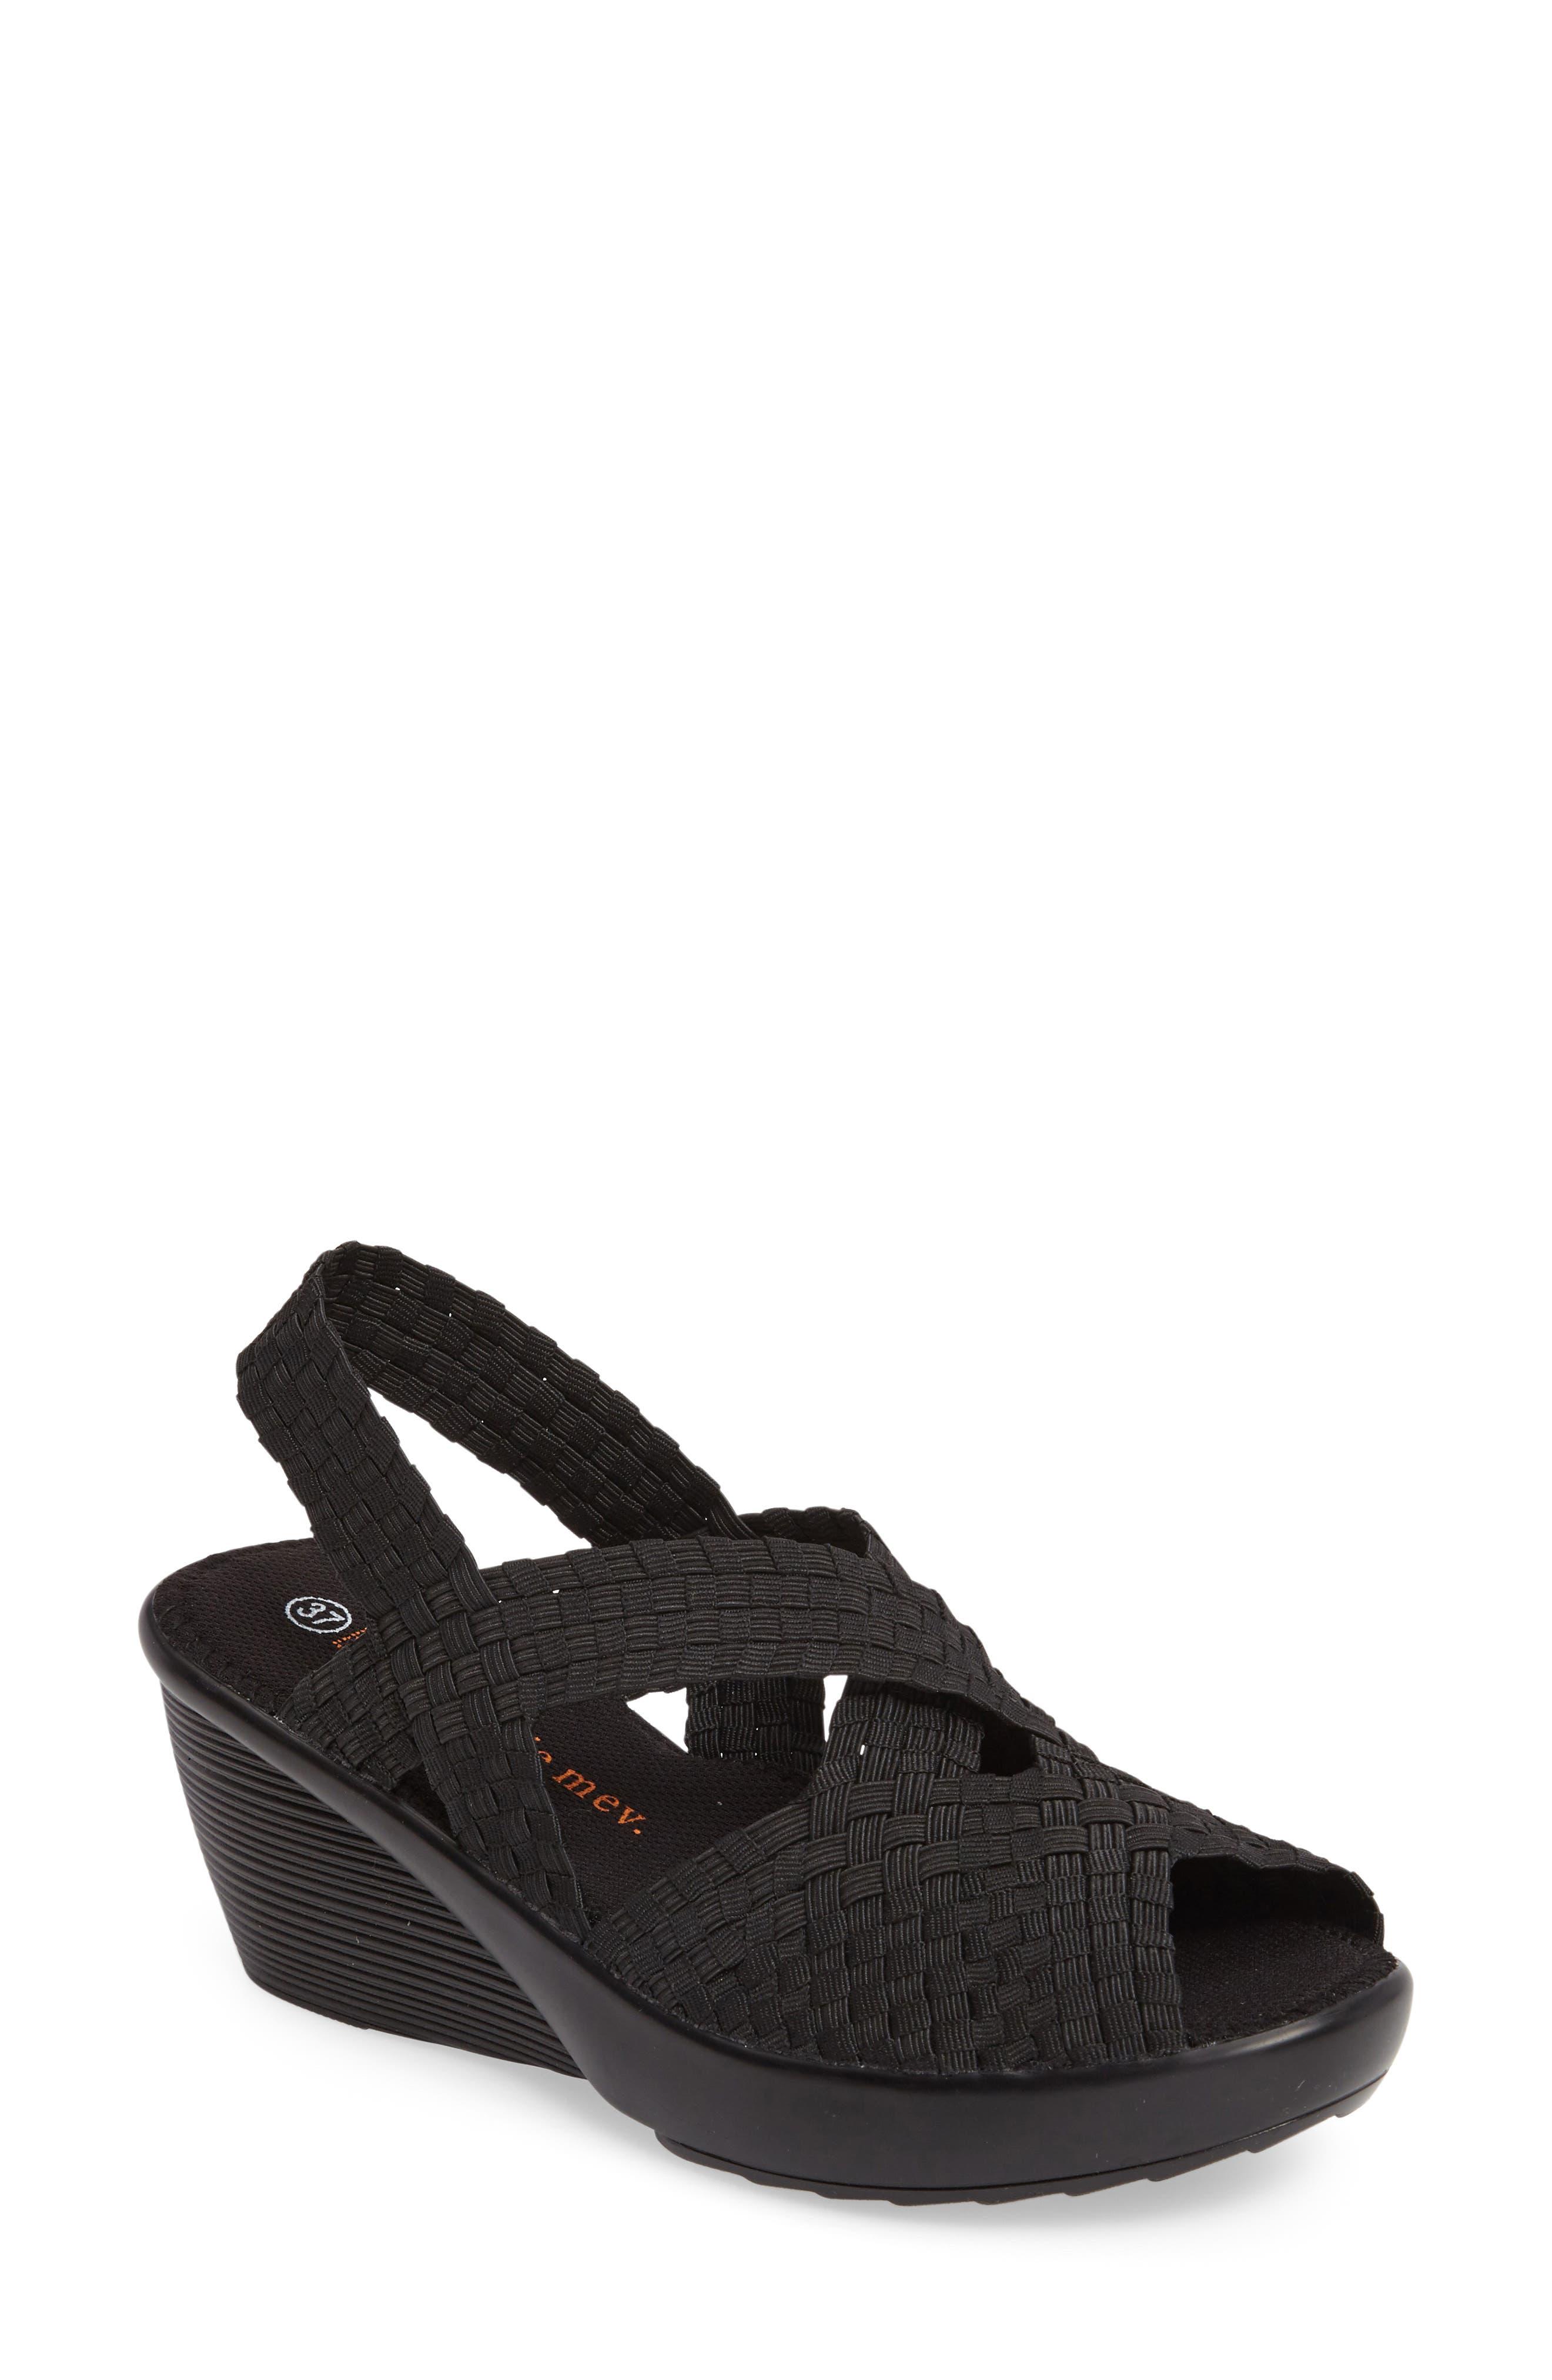 Fresh Brighten Sandal,                         Main,                         color, BLACK FABRIC